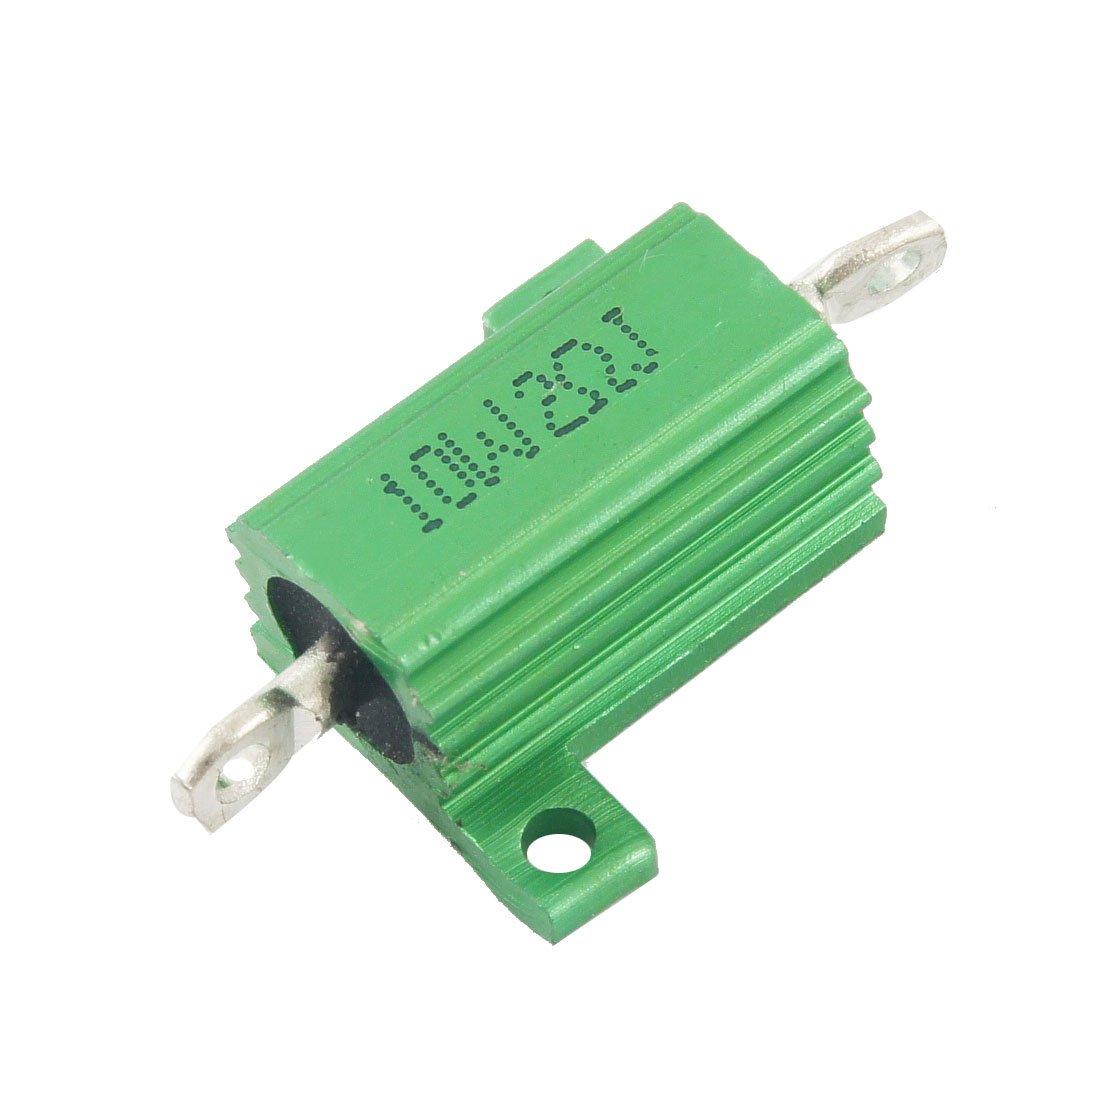 25 Watt Ceramic Cement Power Resistor 2 ohms